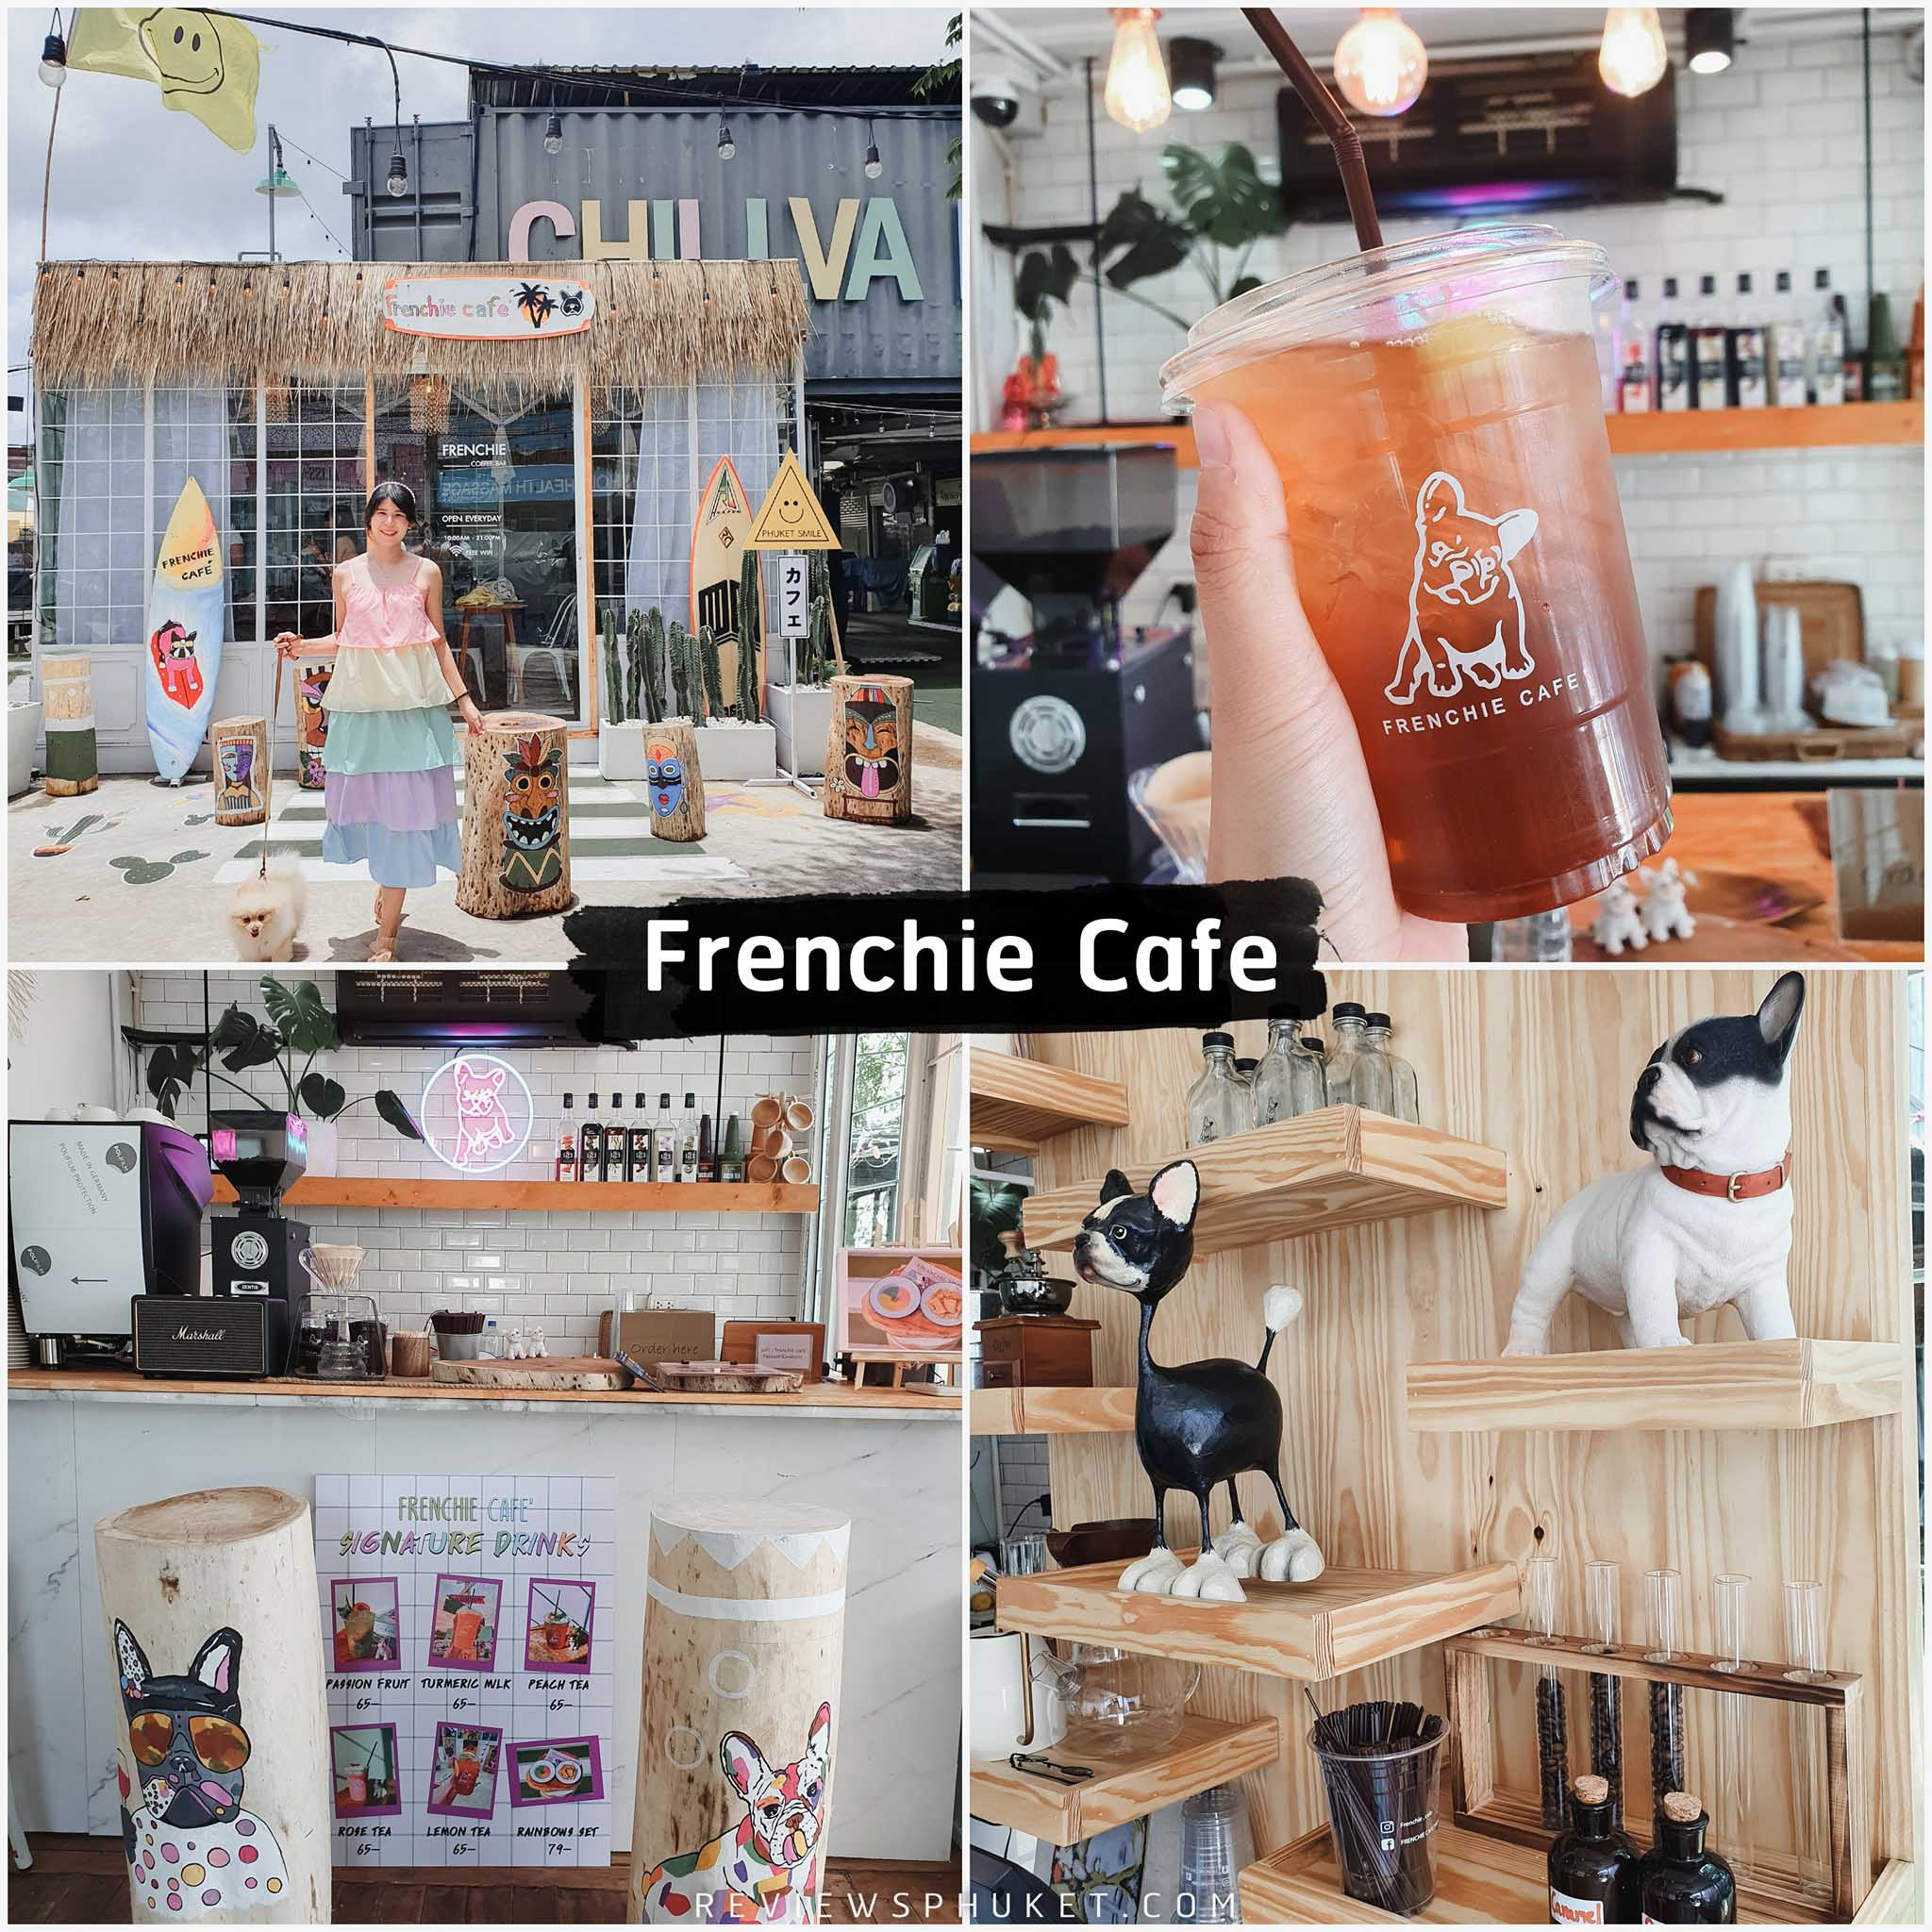 Frenchie-Cafe-ร้านน่ารักสไตล์น้องหมาา ภูเก็ต,คาเฟ่,ที่เที่ยว,ร้านกาแฟ,เด็ด,อร่อย,ต้องลอง